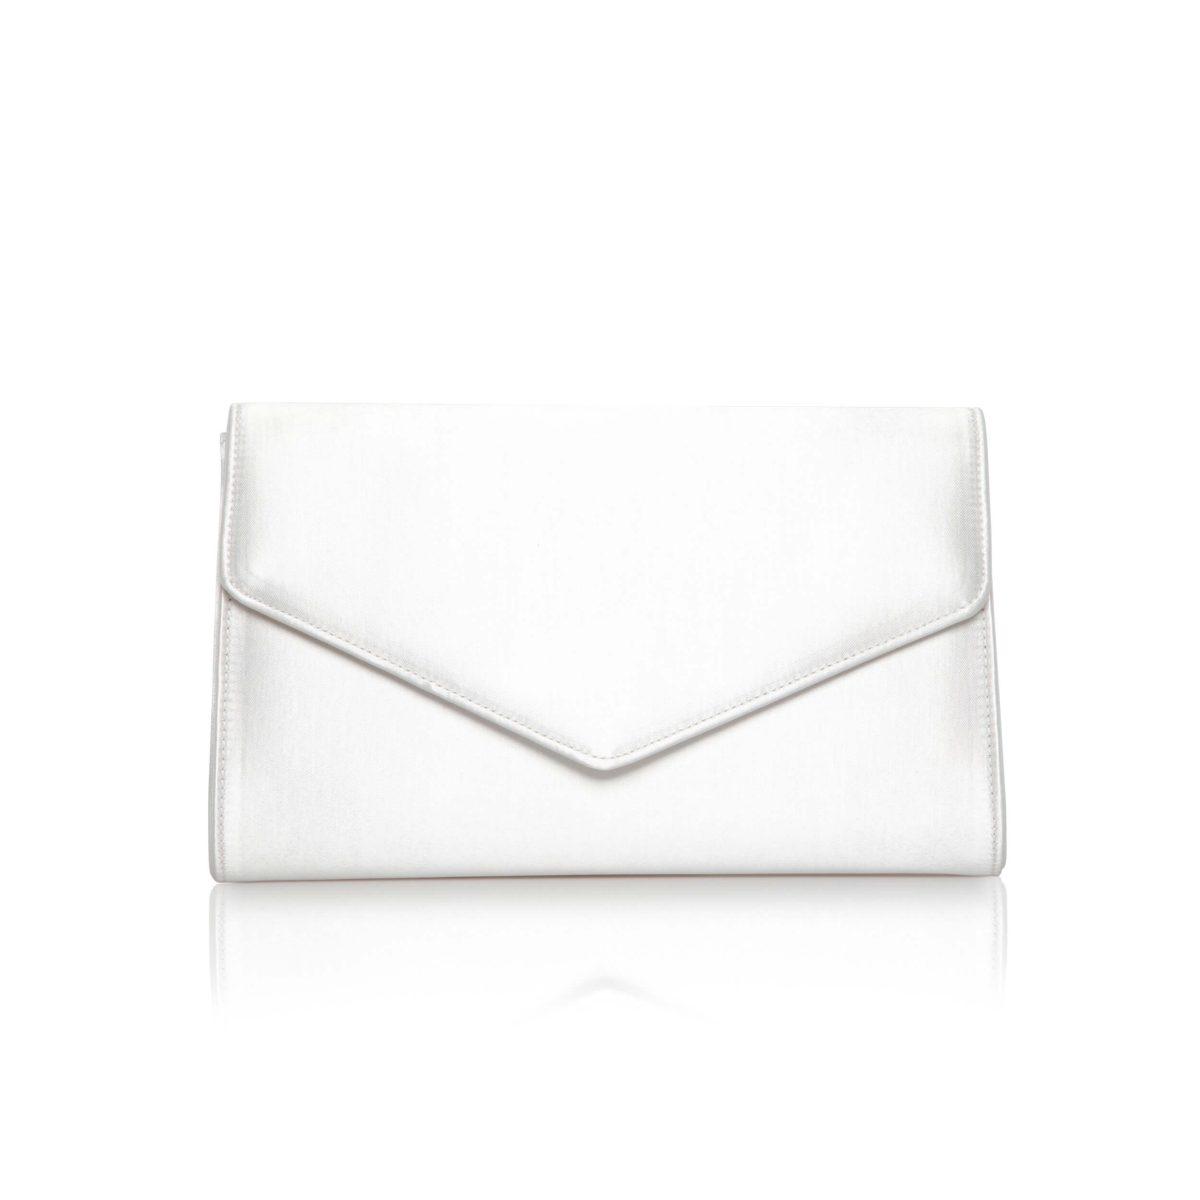 Perfect Bridal Heather Bridal Bag - Ivory 1